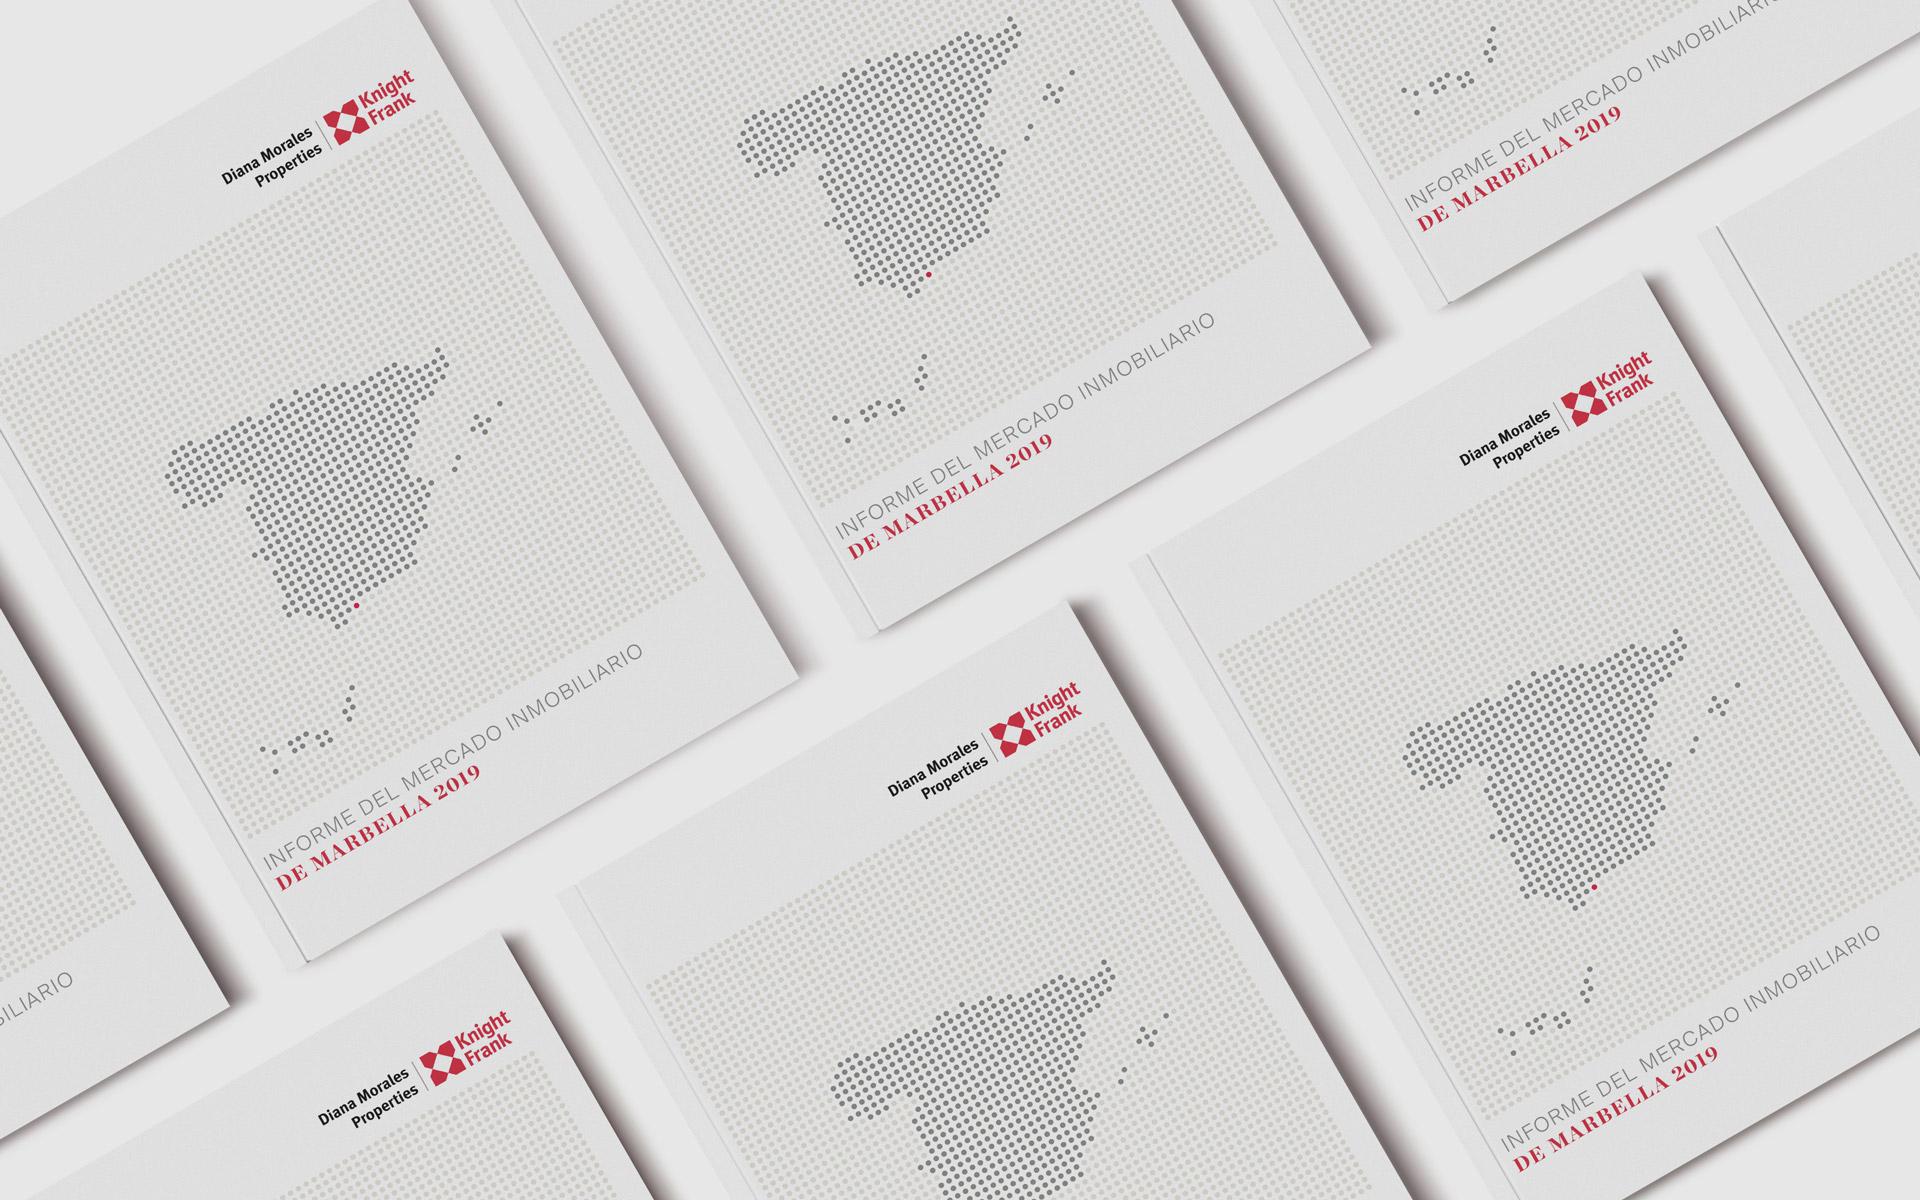 DM Marbella real estate market report 2019